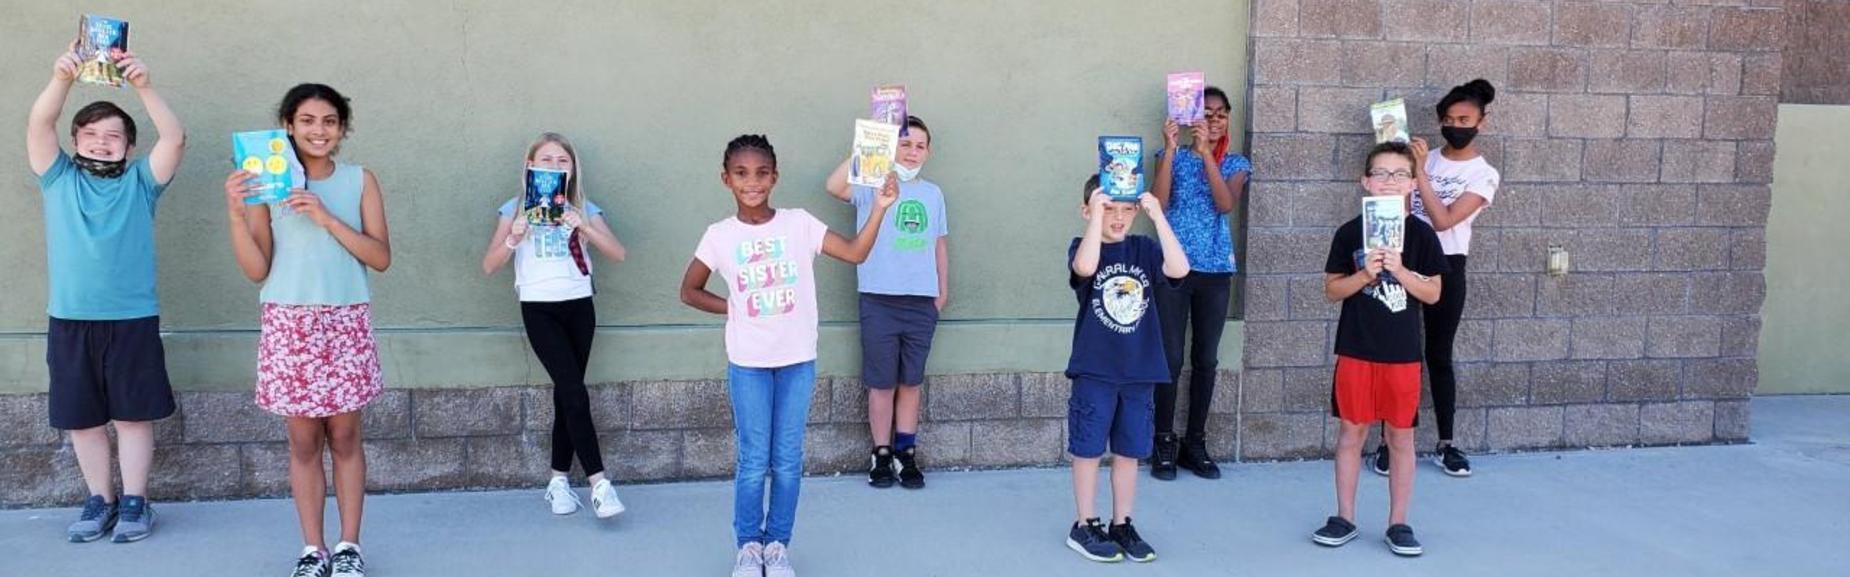 book recipients